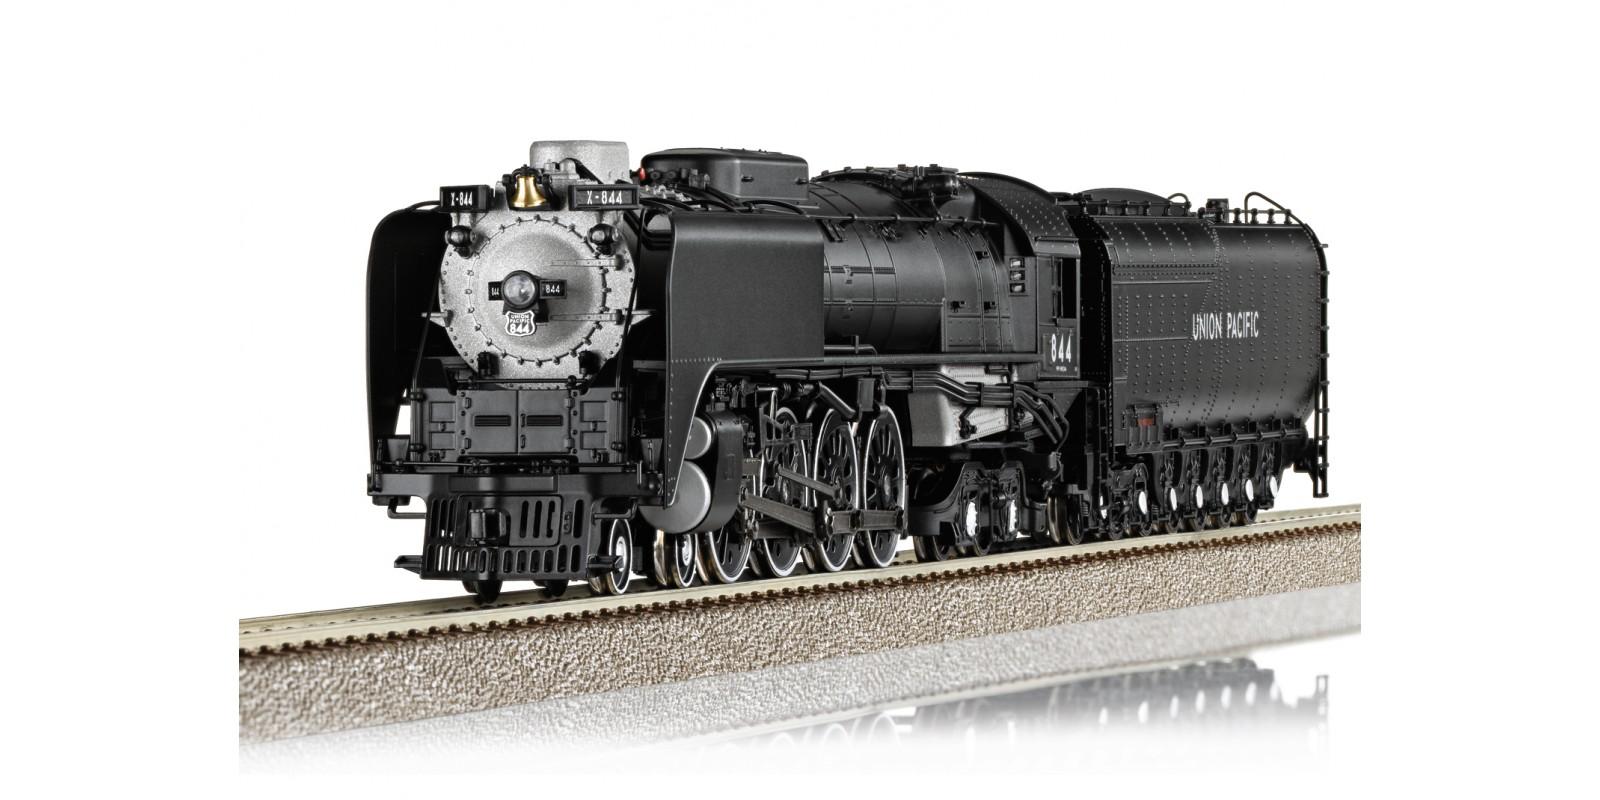 T25984 Class 800 Steam Locomotive